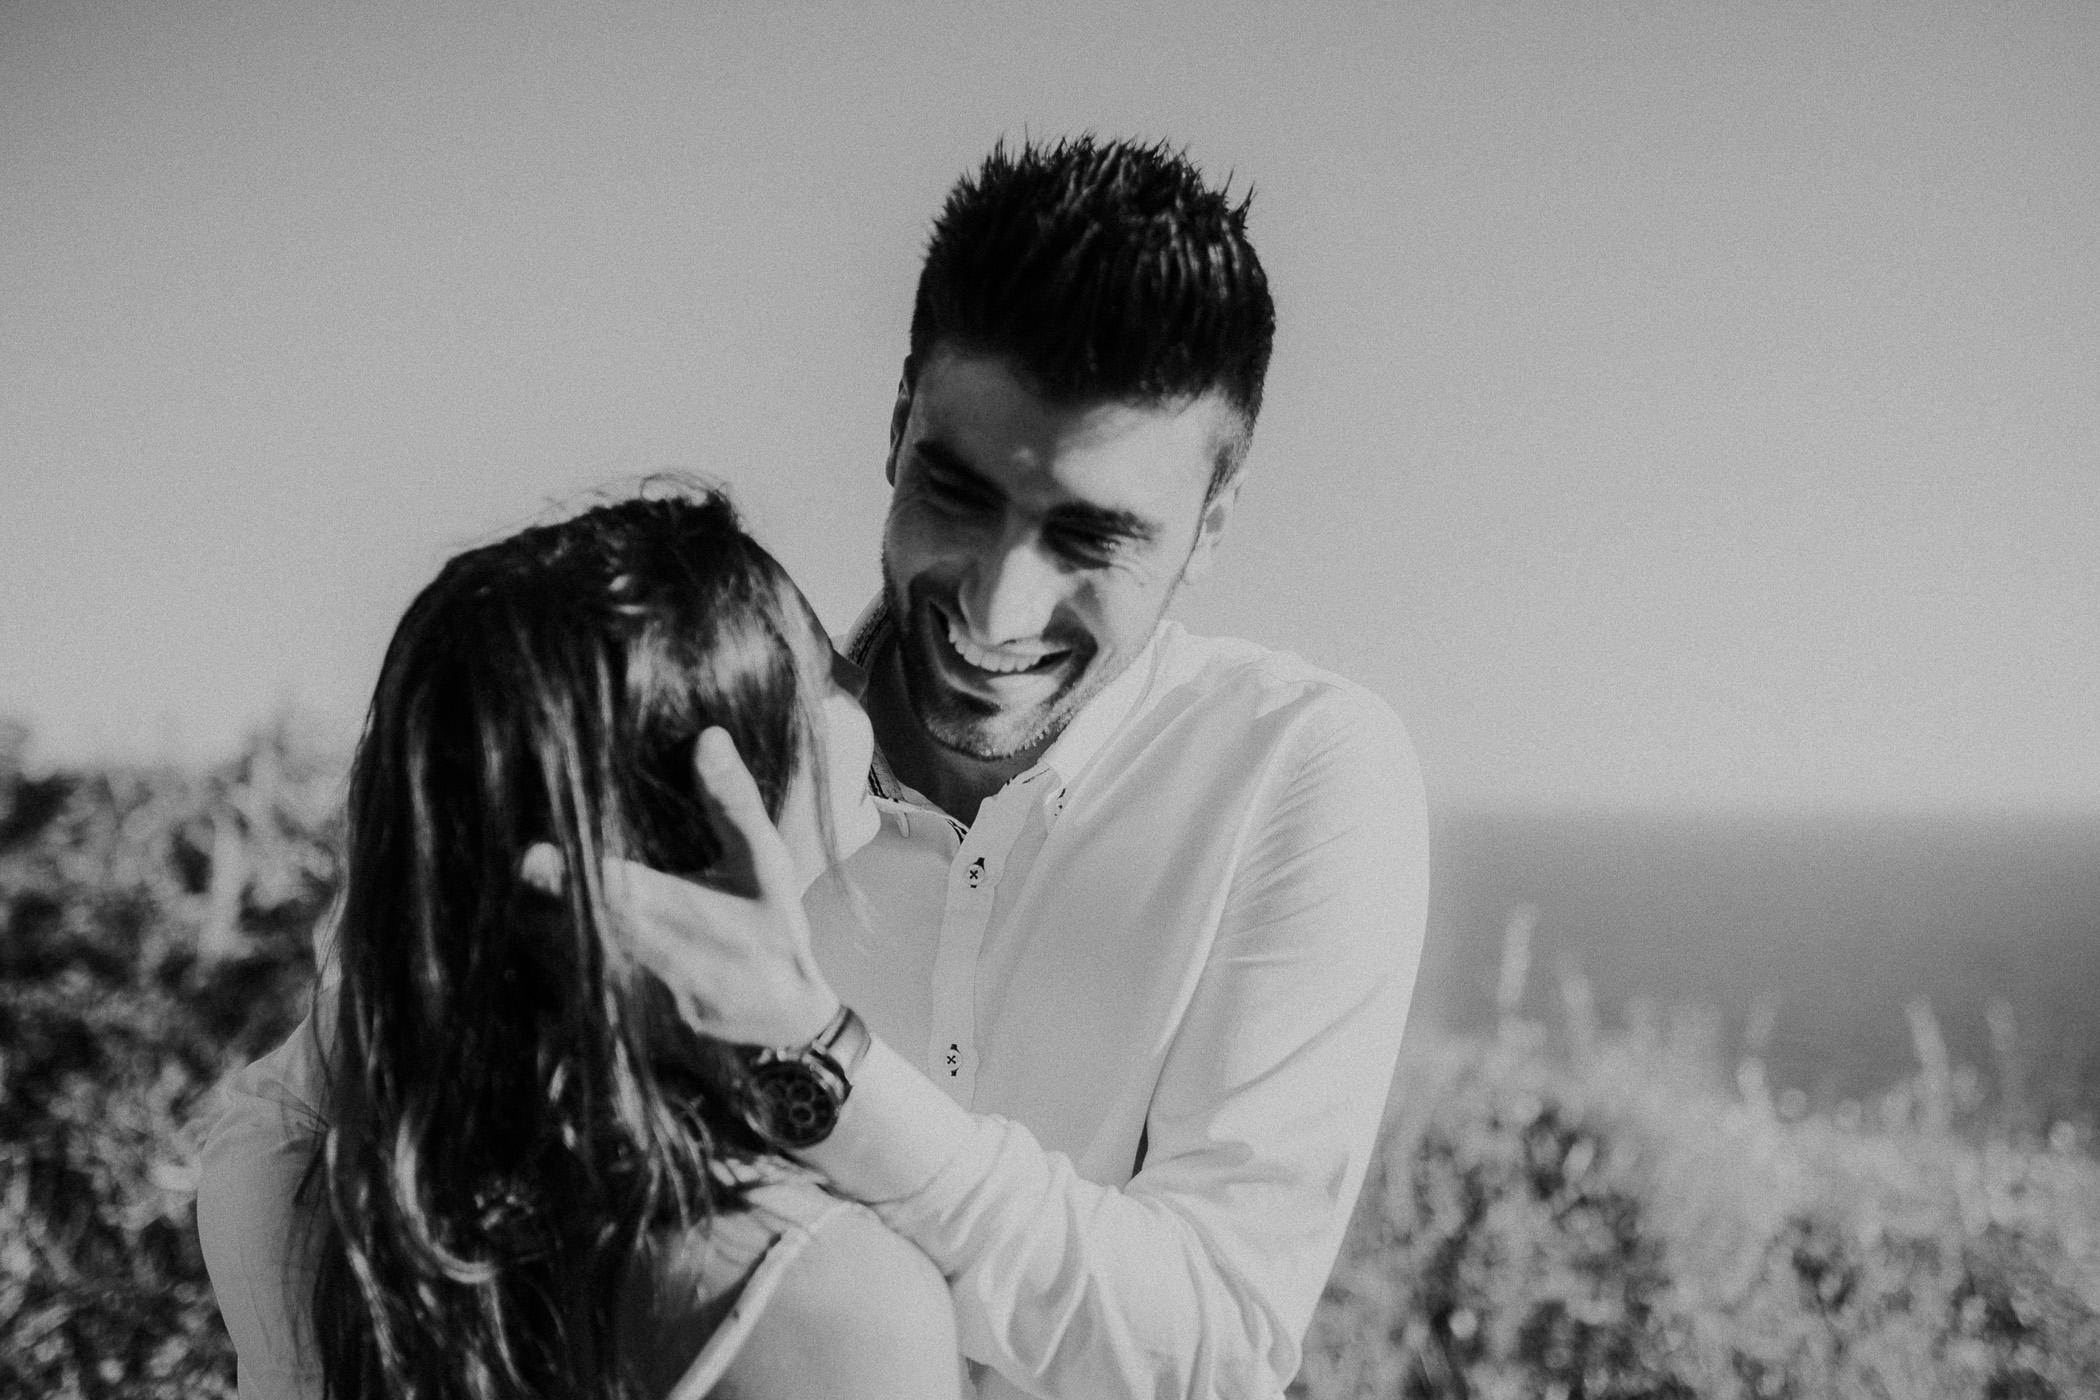 DanielaMarquardtPhotography_wedding_elopement_mallorca_spain_calapi_palma_lauraandtoni_302